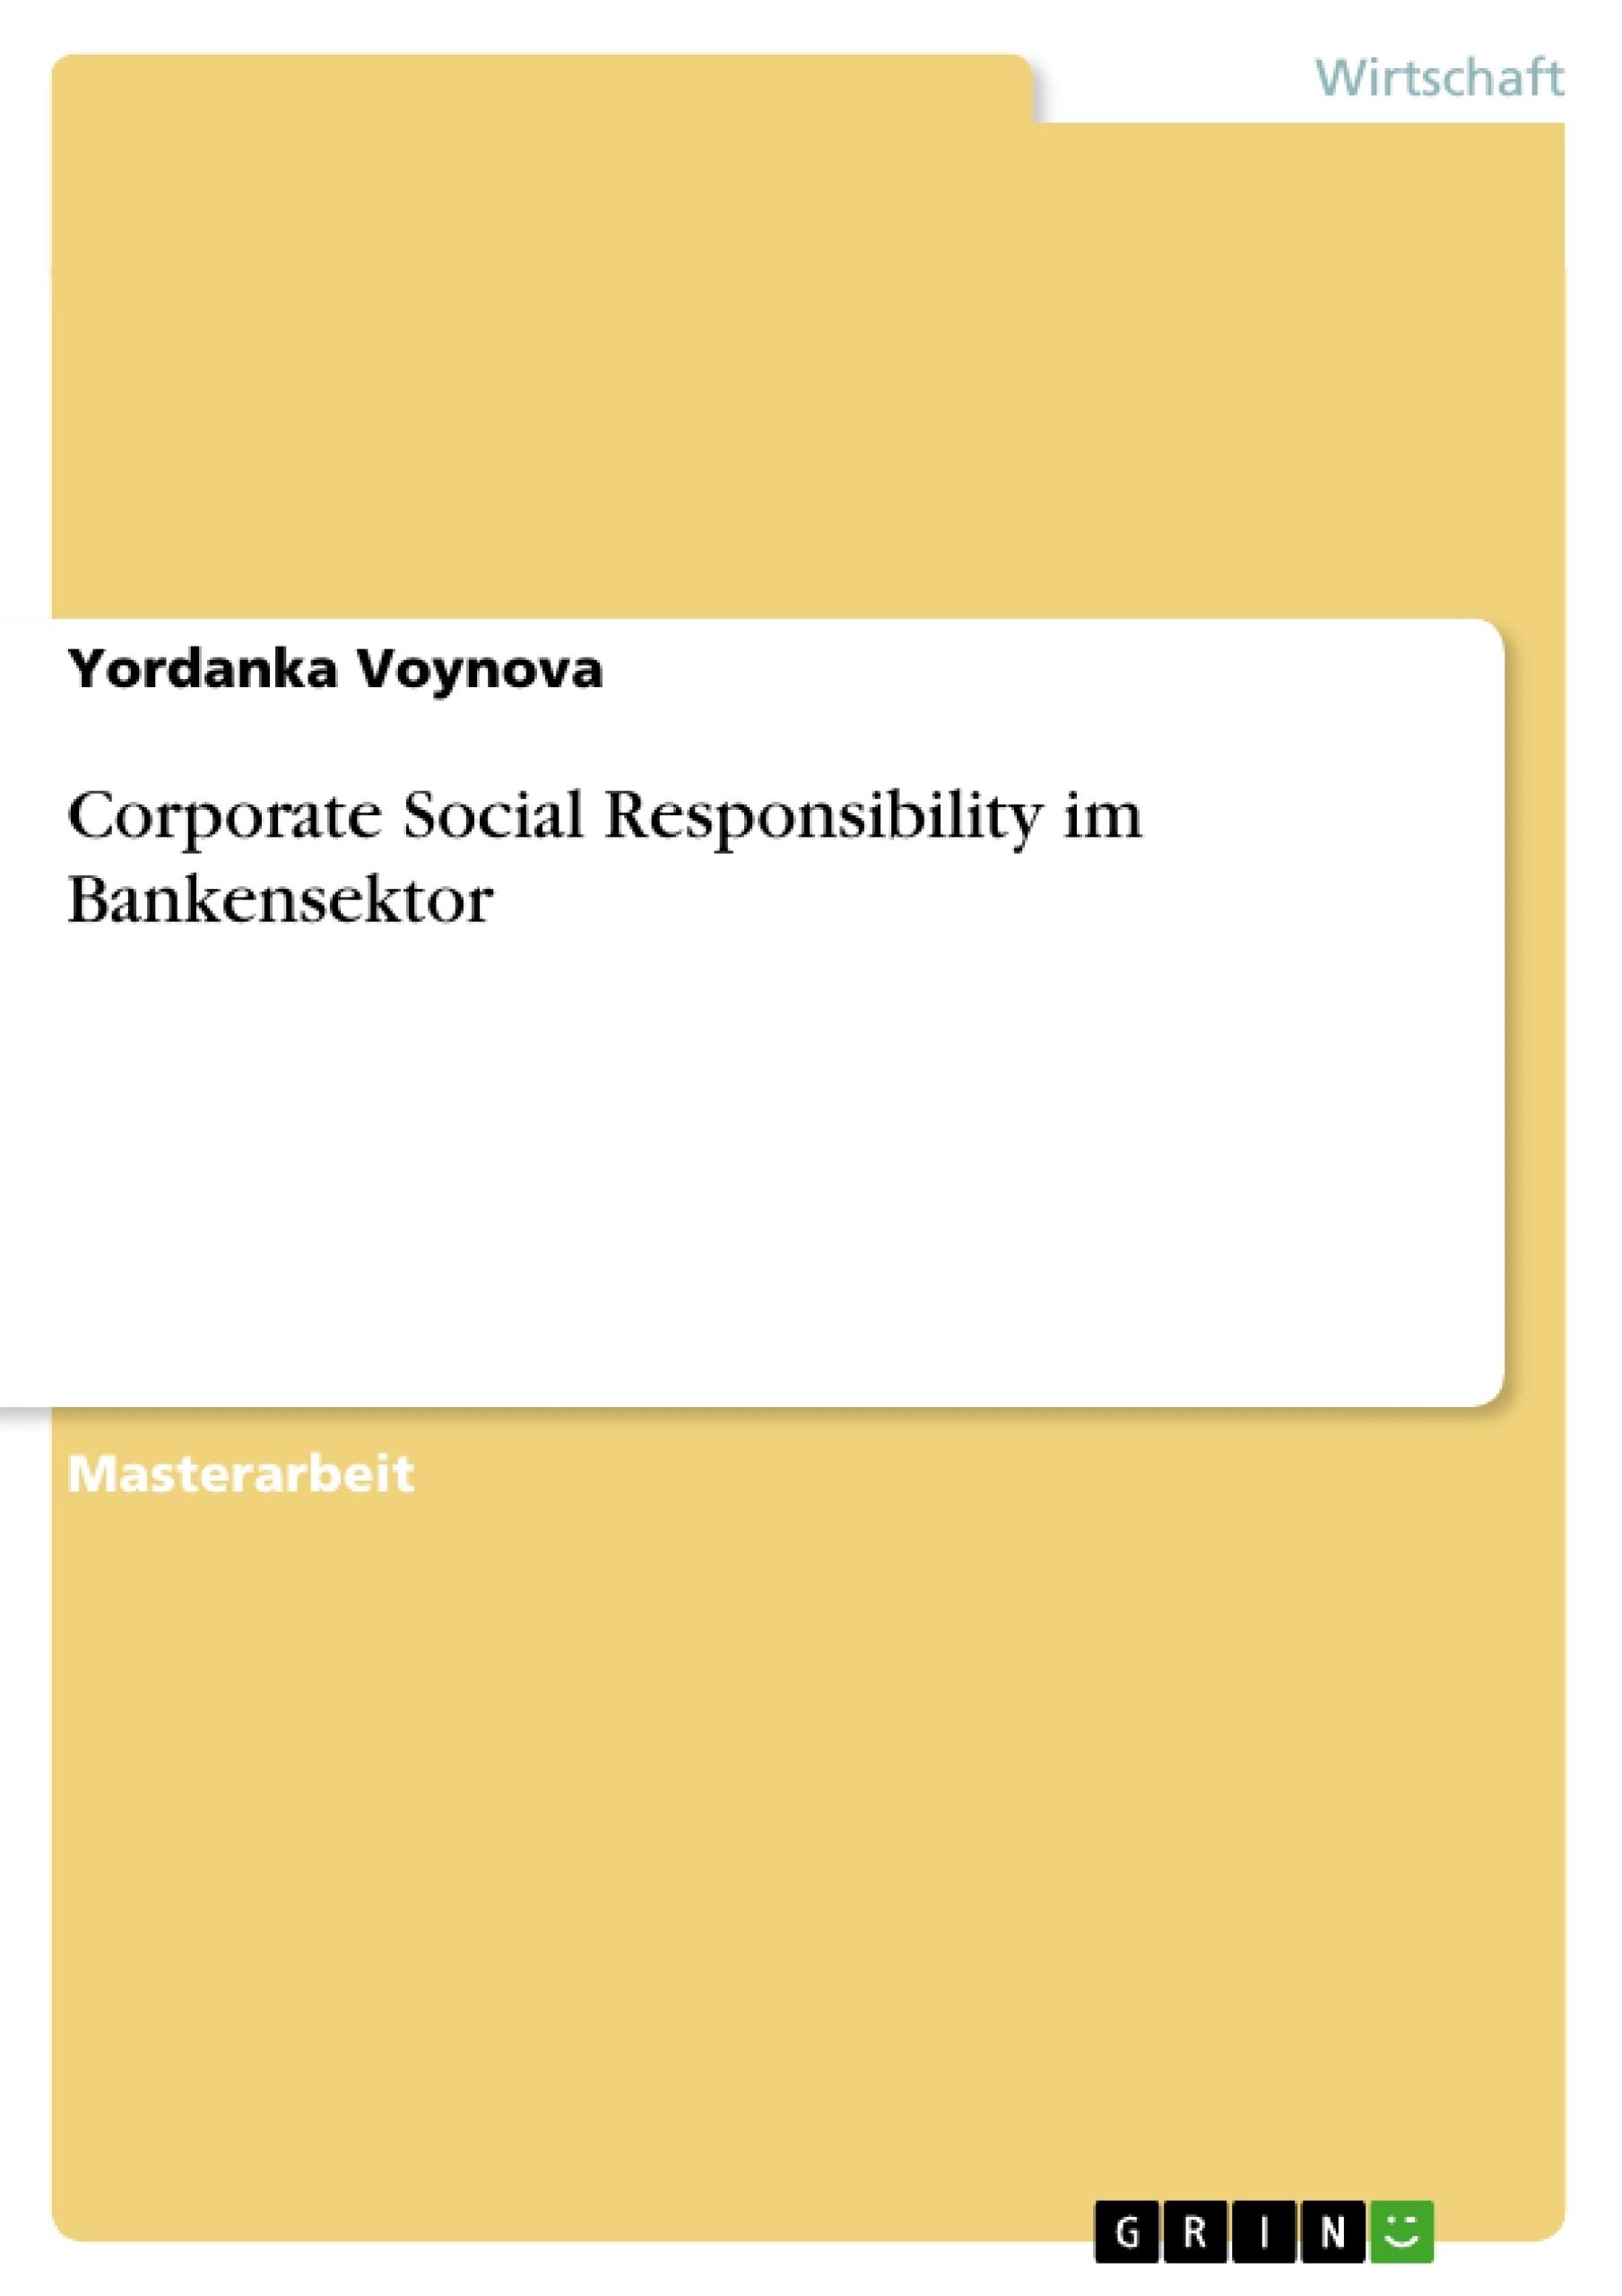 Titel: Corporate Social Responsibility im Bankensektor